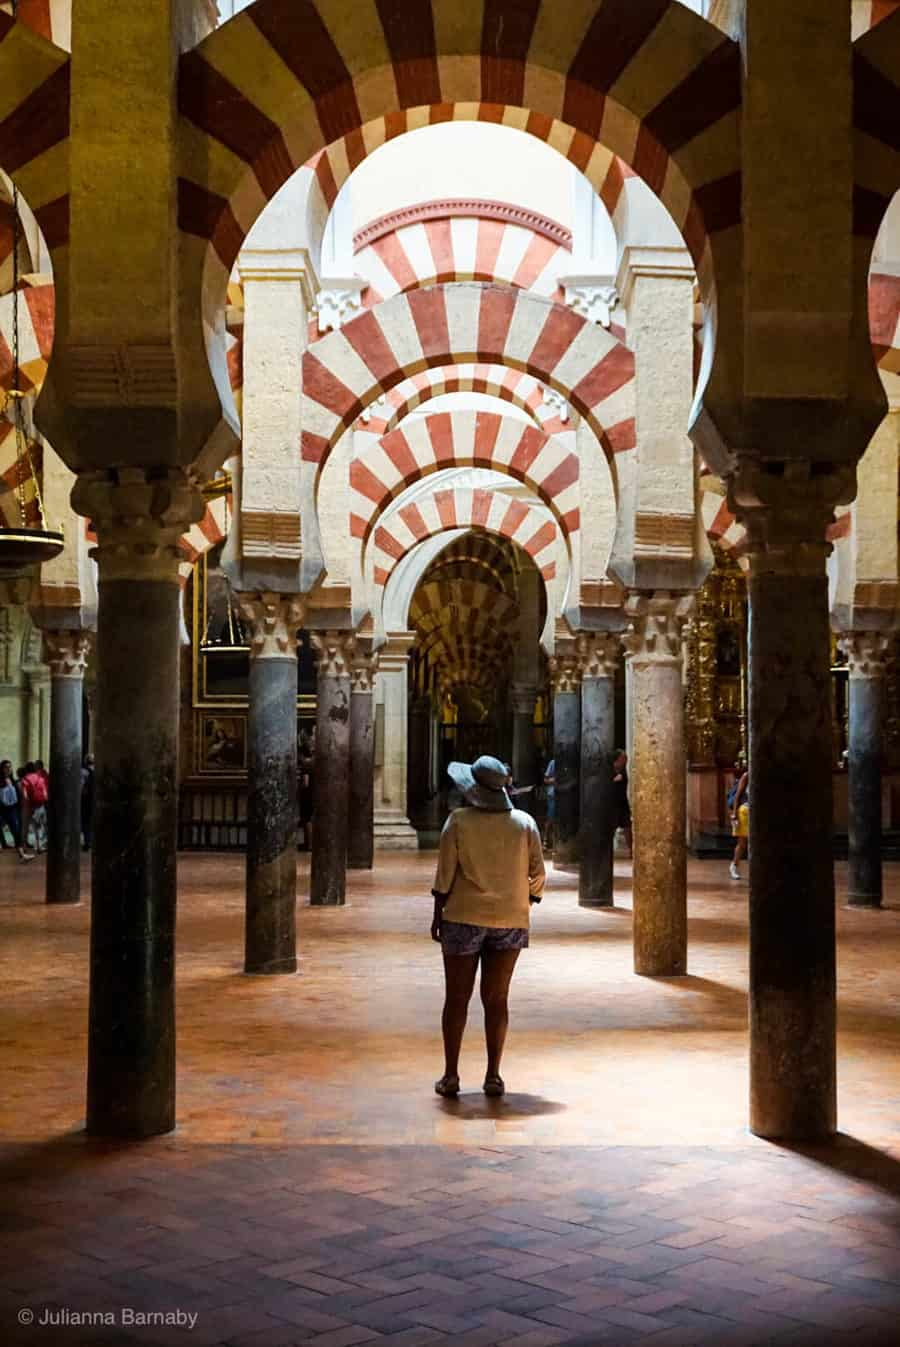 Cordoba's Mesquita - a Legacy of Moorish Spain